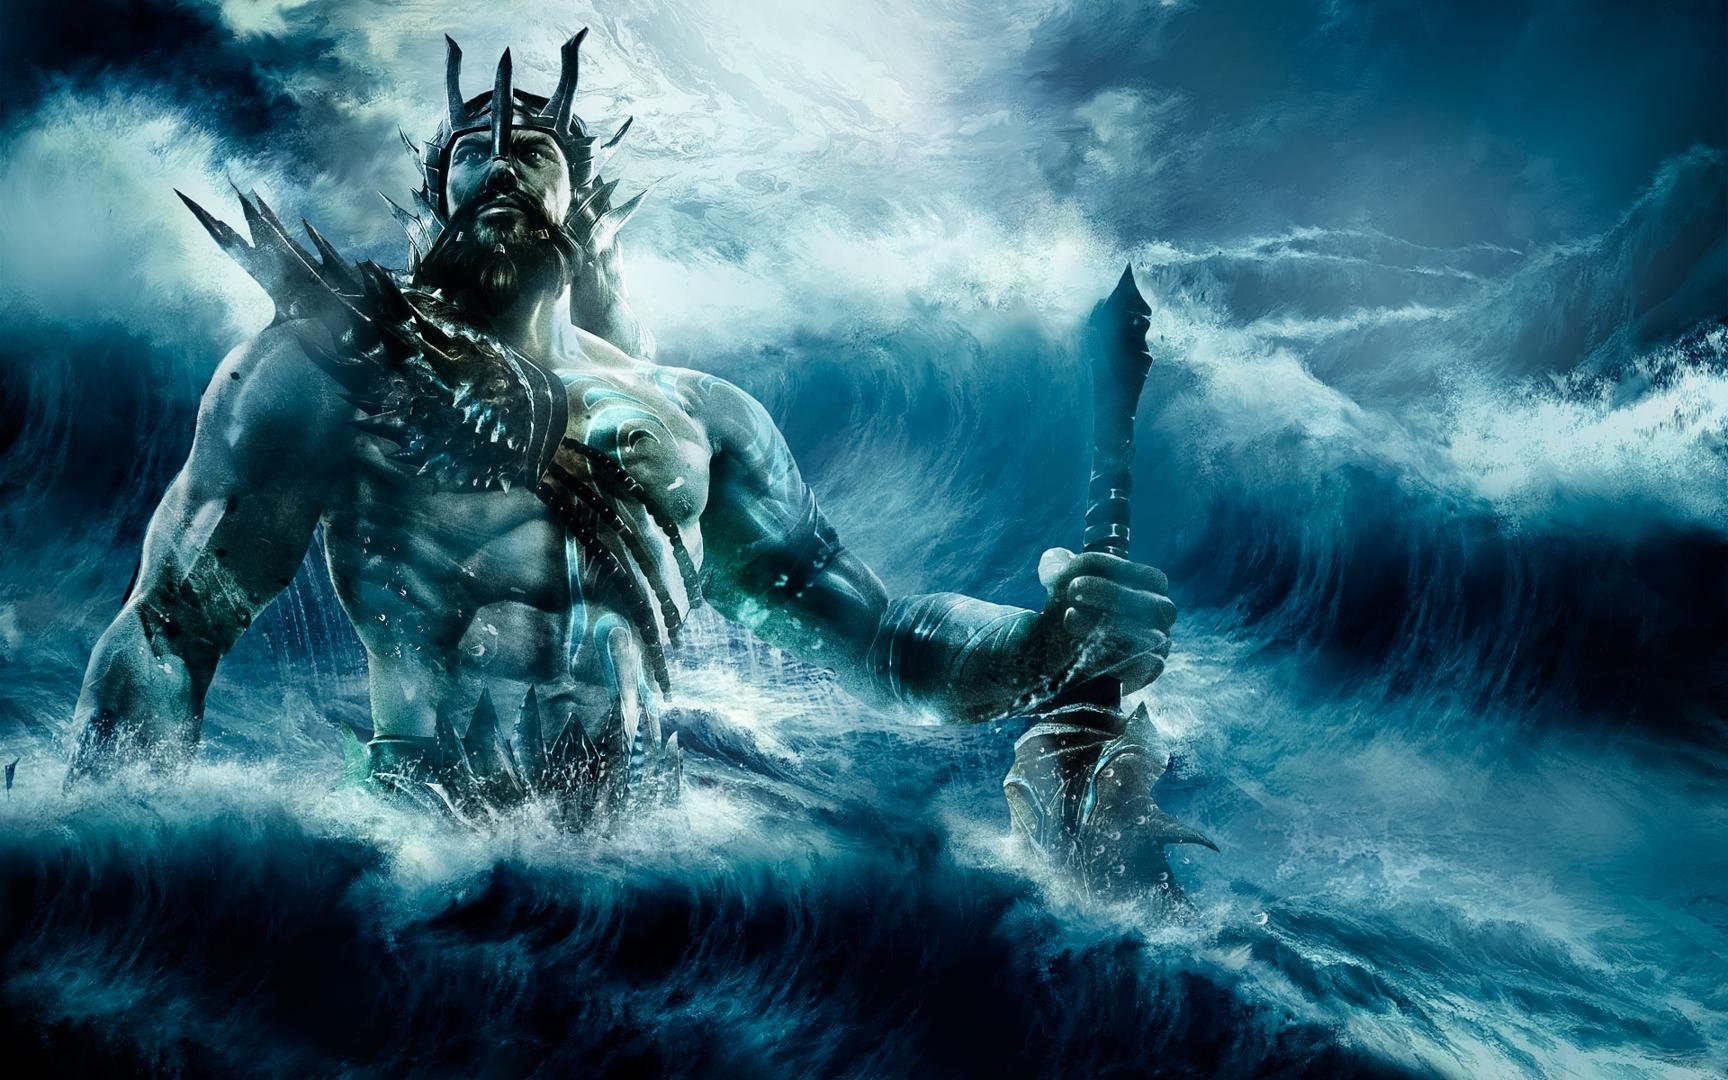 Želeo je žrtve i vodio duše u Nav: Pre dobrog Nikole u vodama se skrivao Voden